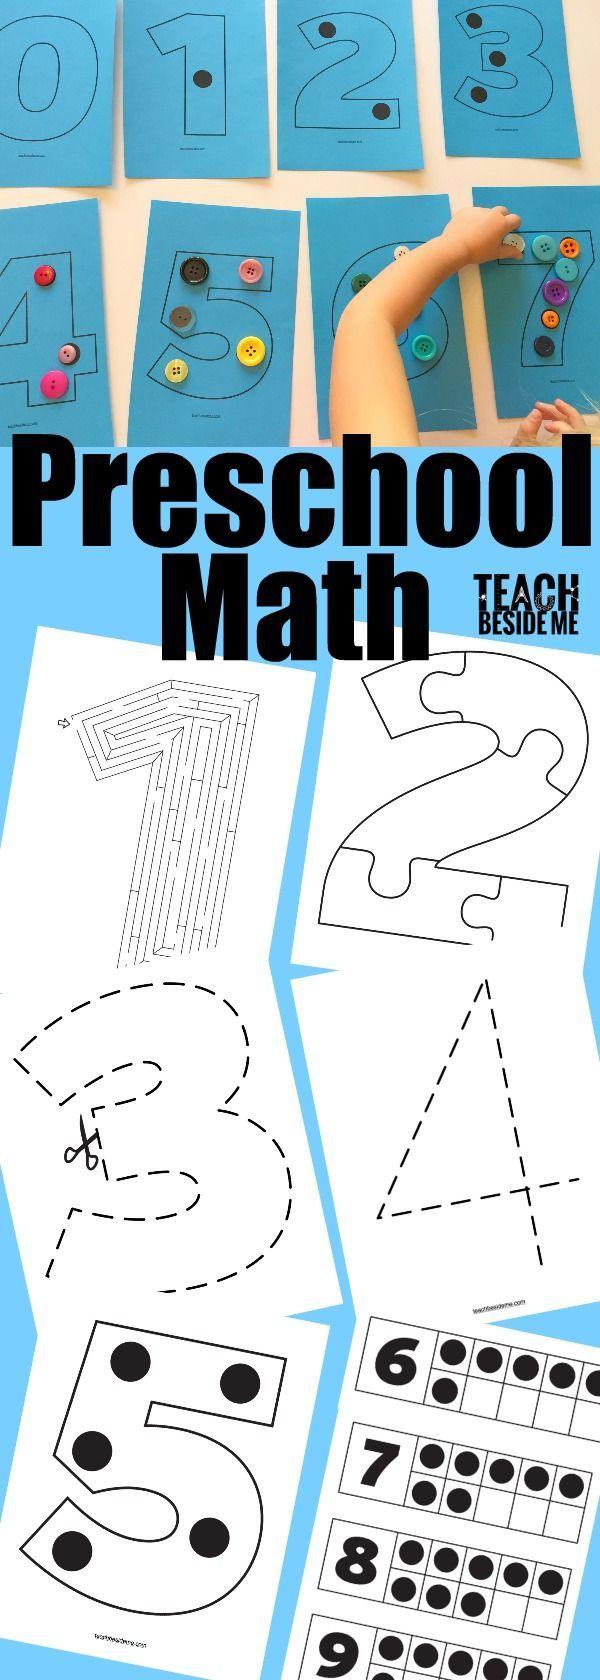 Preschool Math Activities | Preschool math activities, Number ...